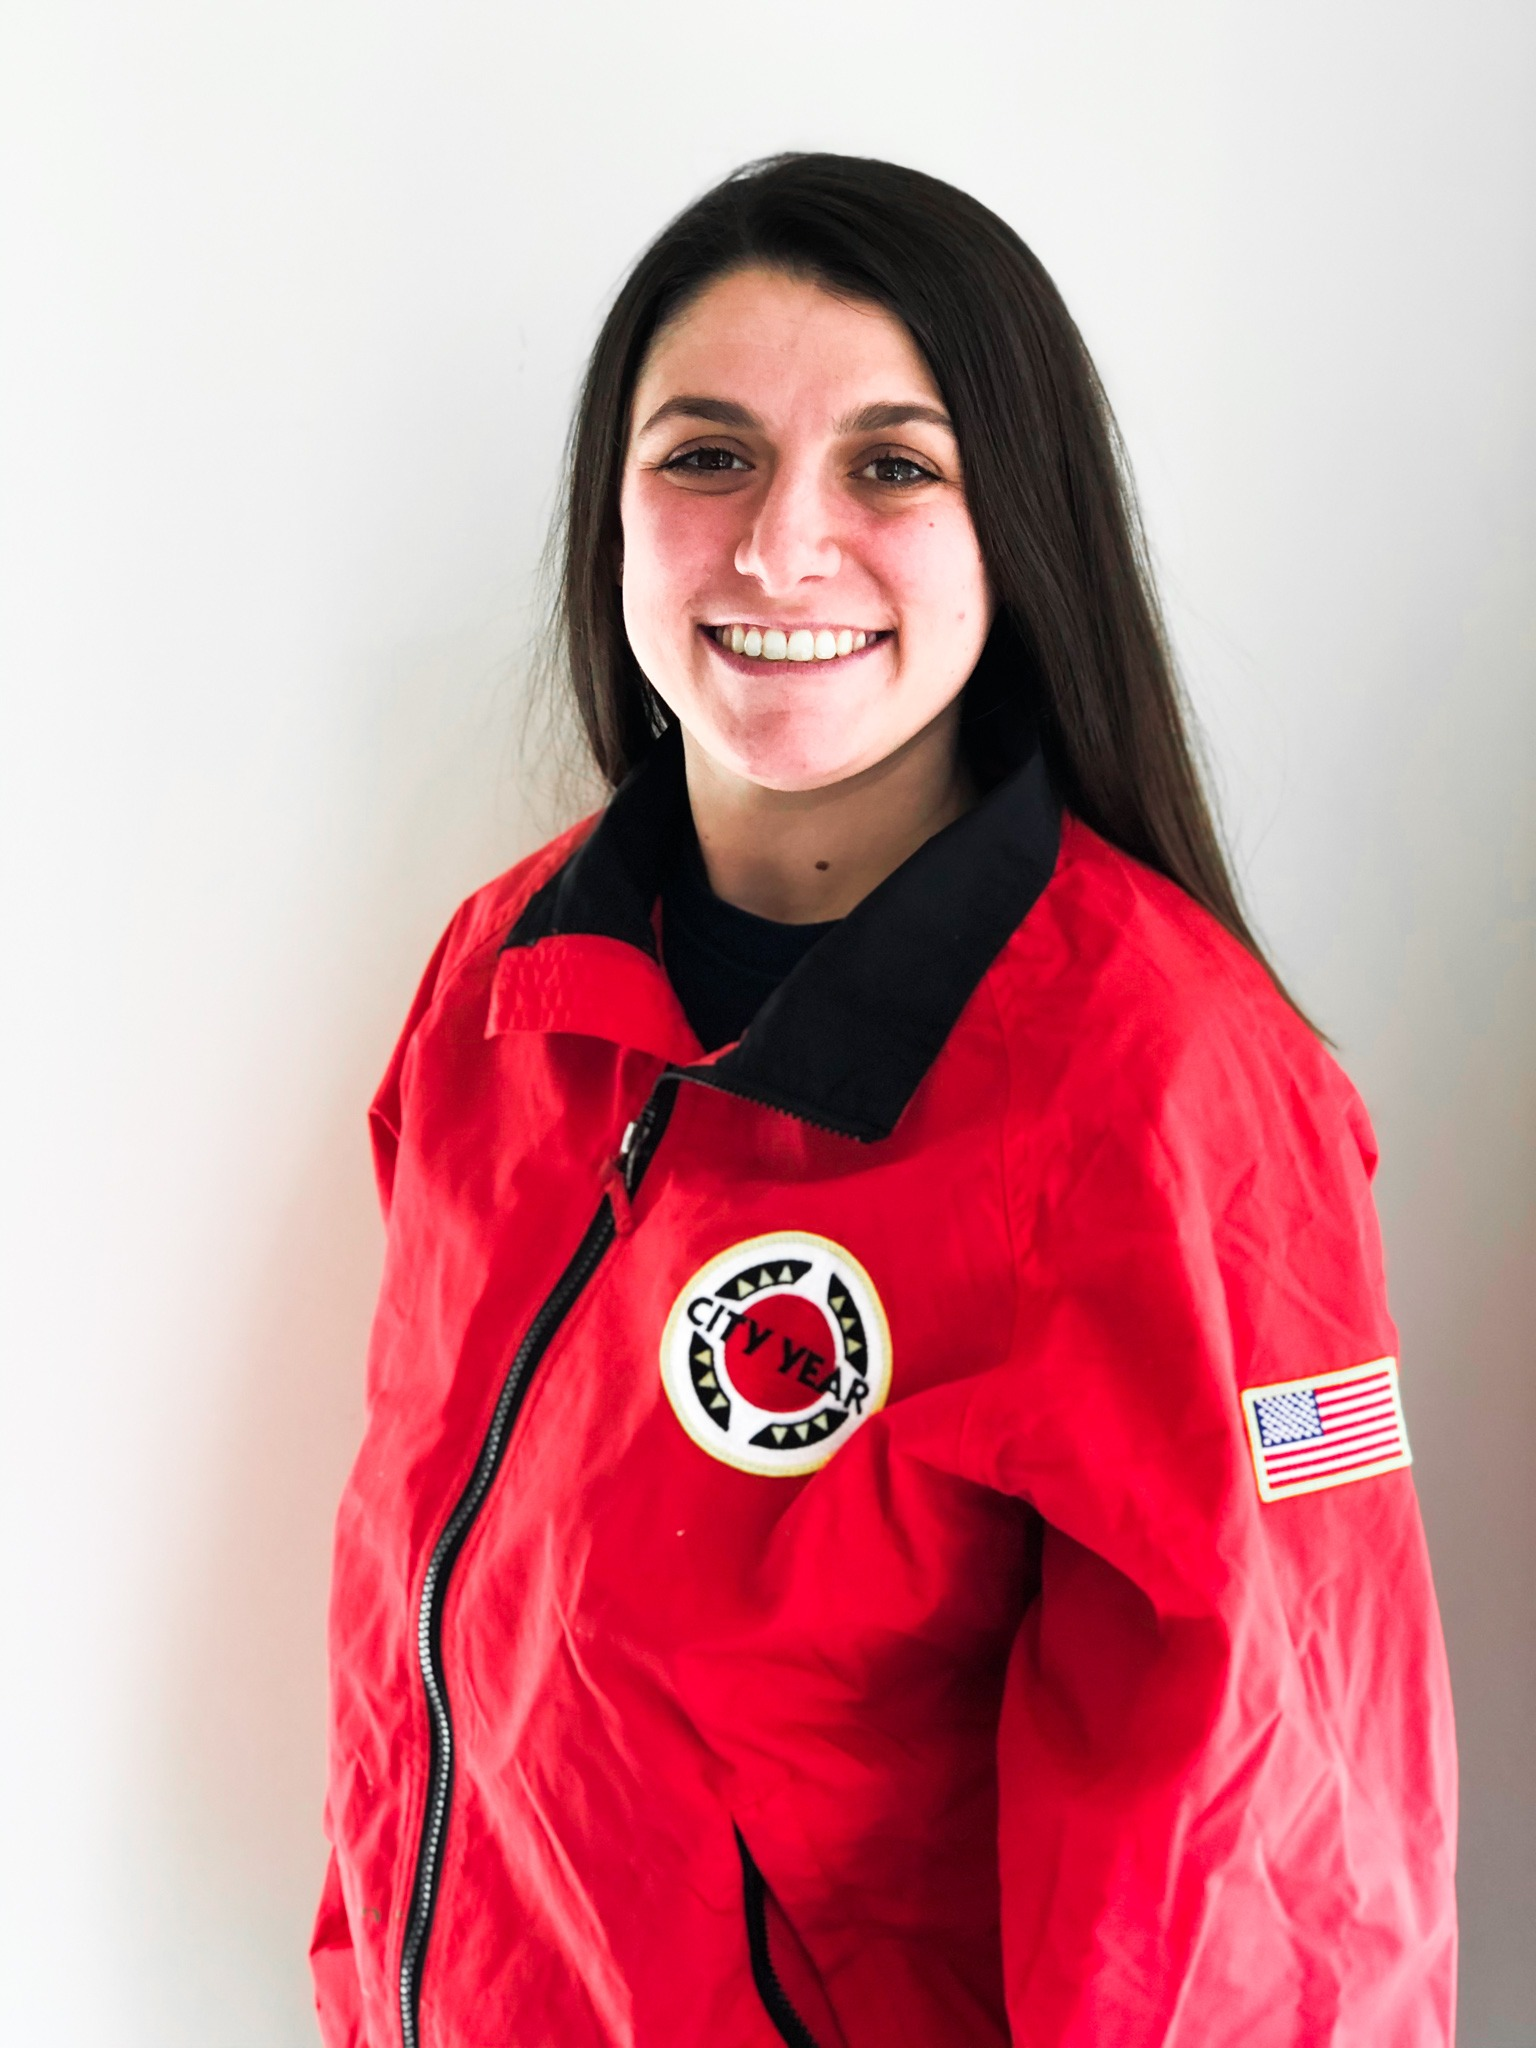 Danean Balestrieri in a CY red jacket